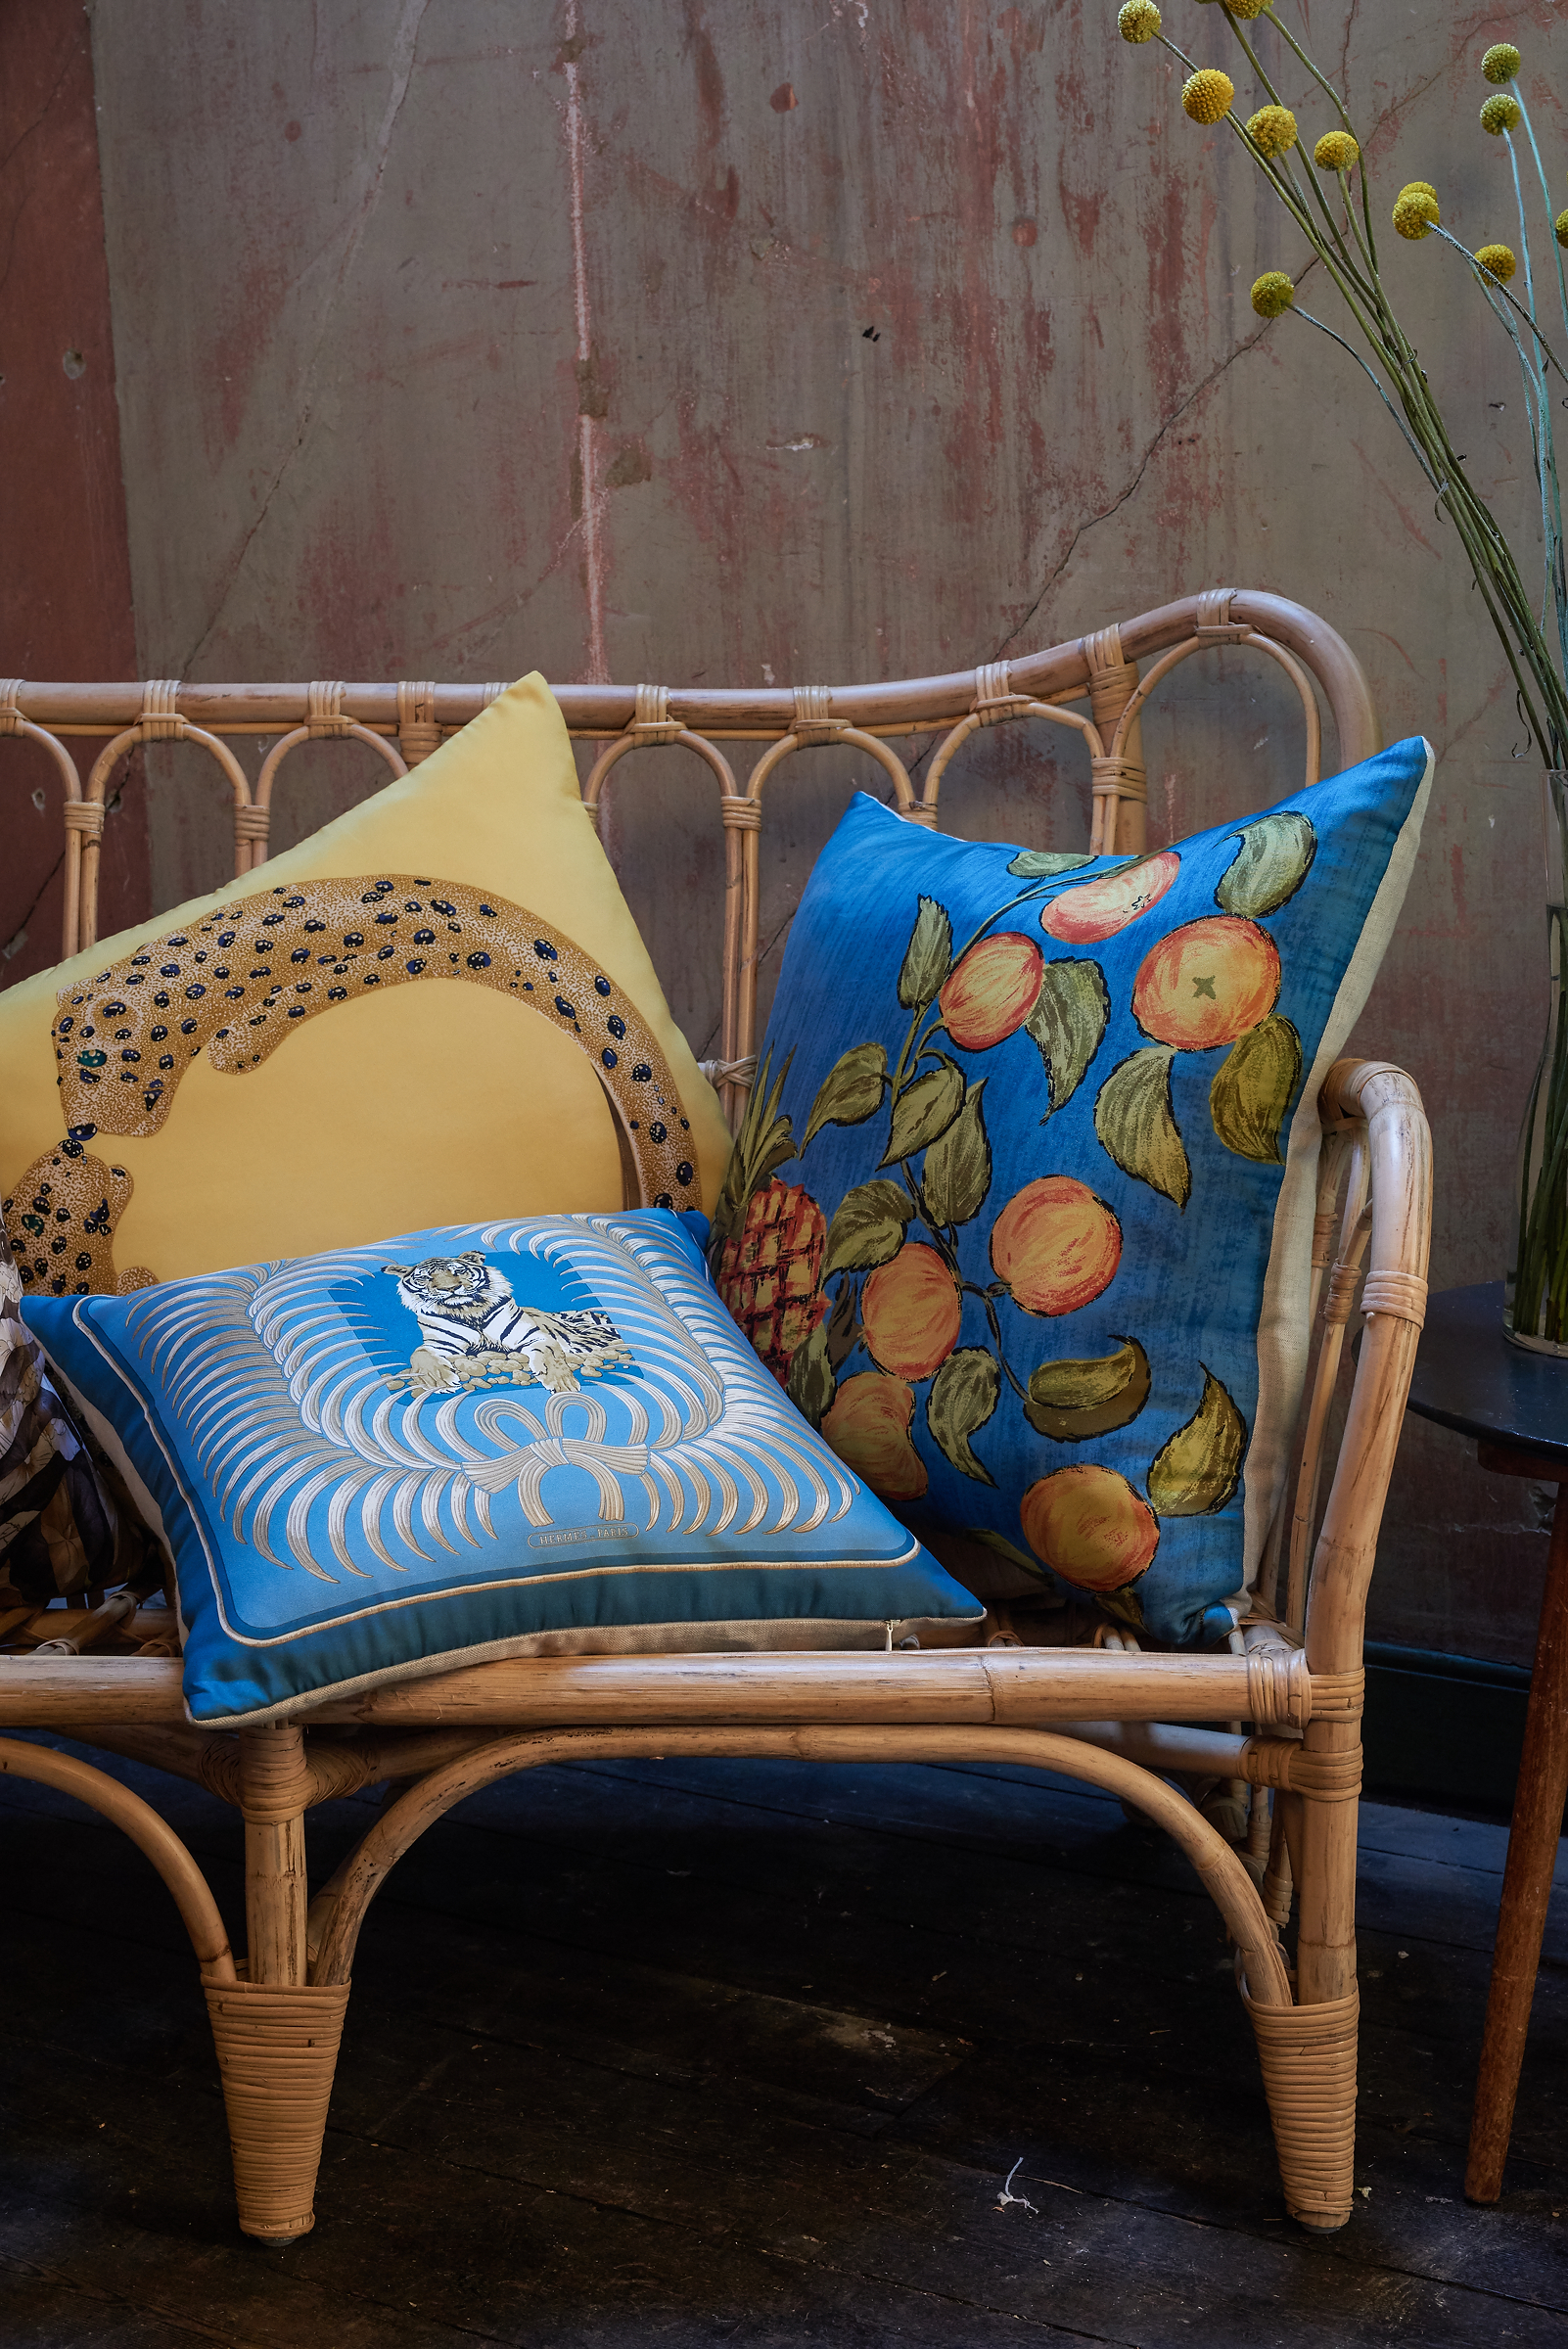 Belfast designer Katie Larmour's Luxury Handcrafted Vintage Silk Scarf and Irish Linen Cushions Pillows, 2014, Brown Thomas Dublin Ireland 1.JPG